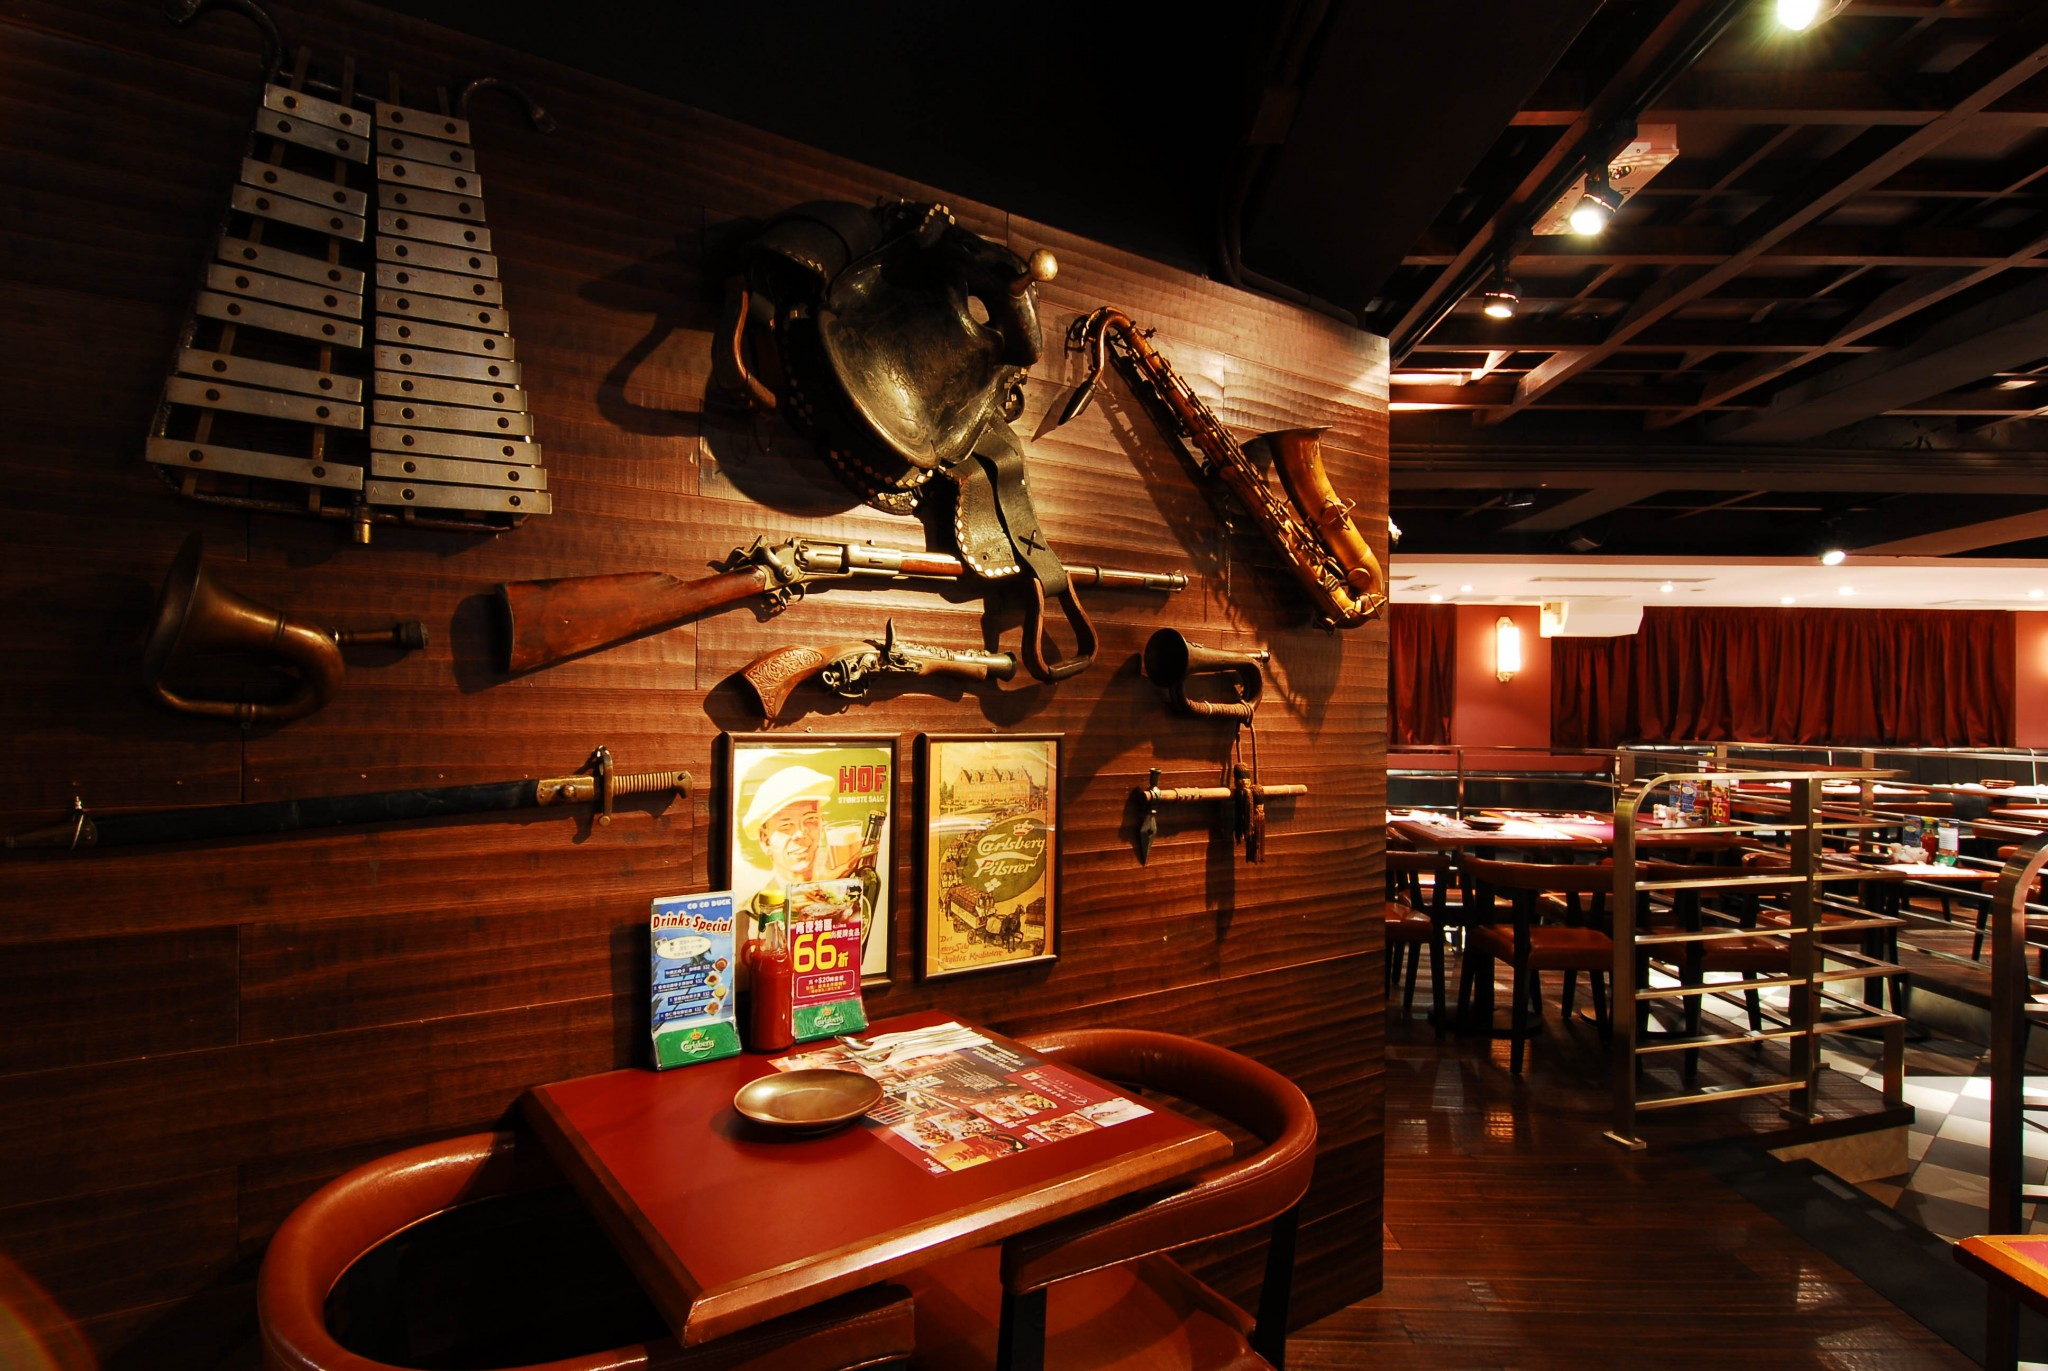 Tsuen Wan (26-40 Chung On Street) 荃灣海壩街歌德餐廳酒吧 桌球 飛鏢